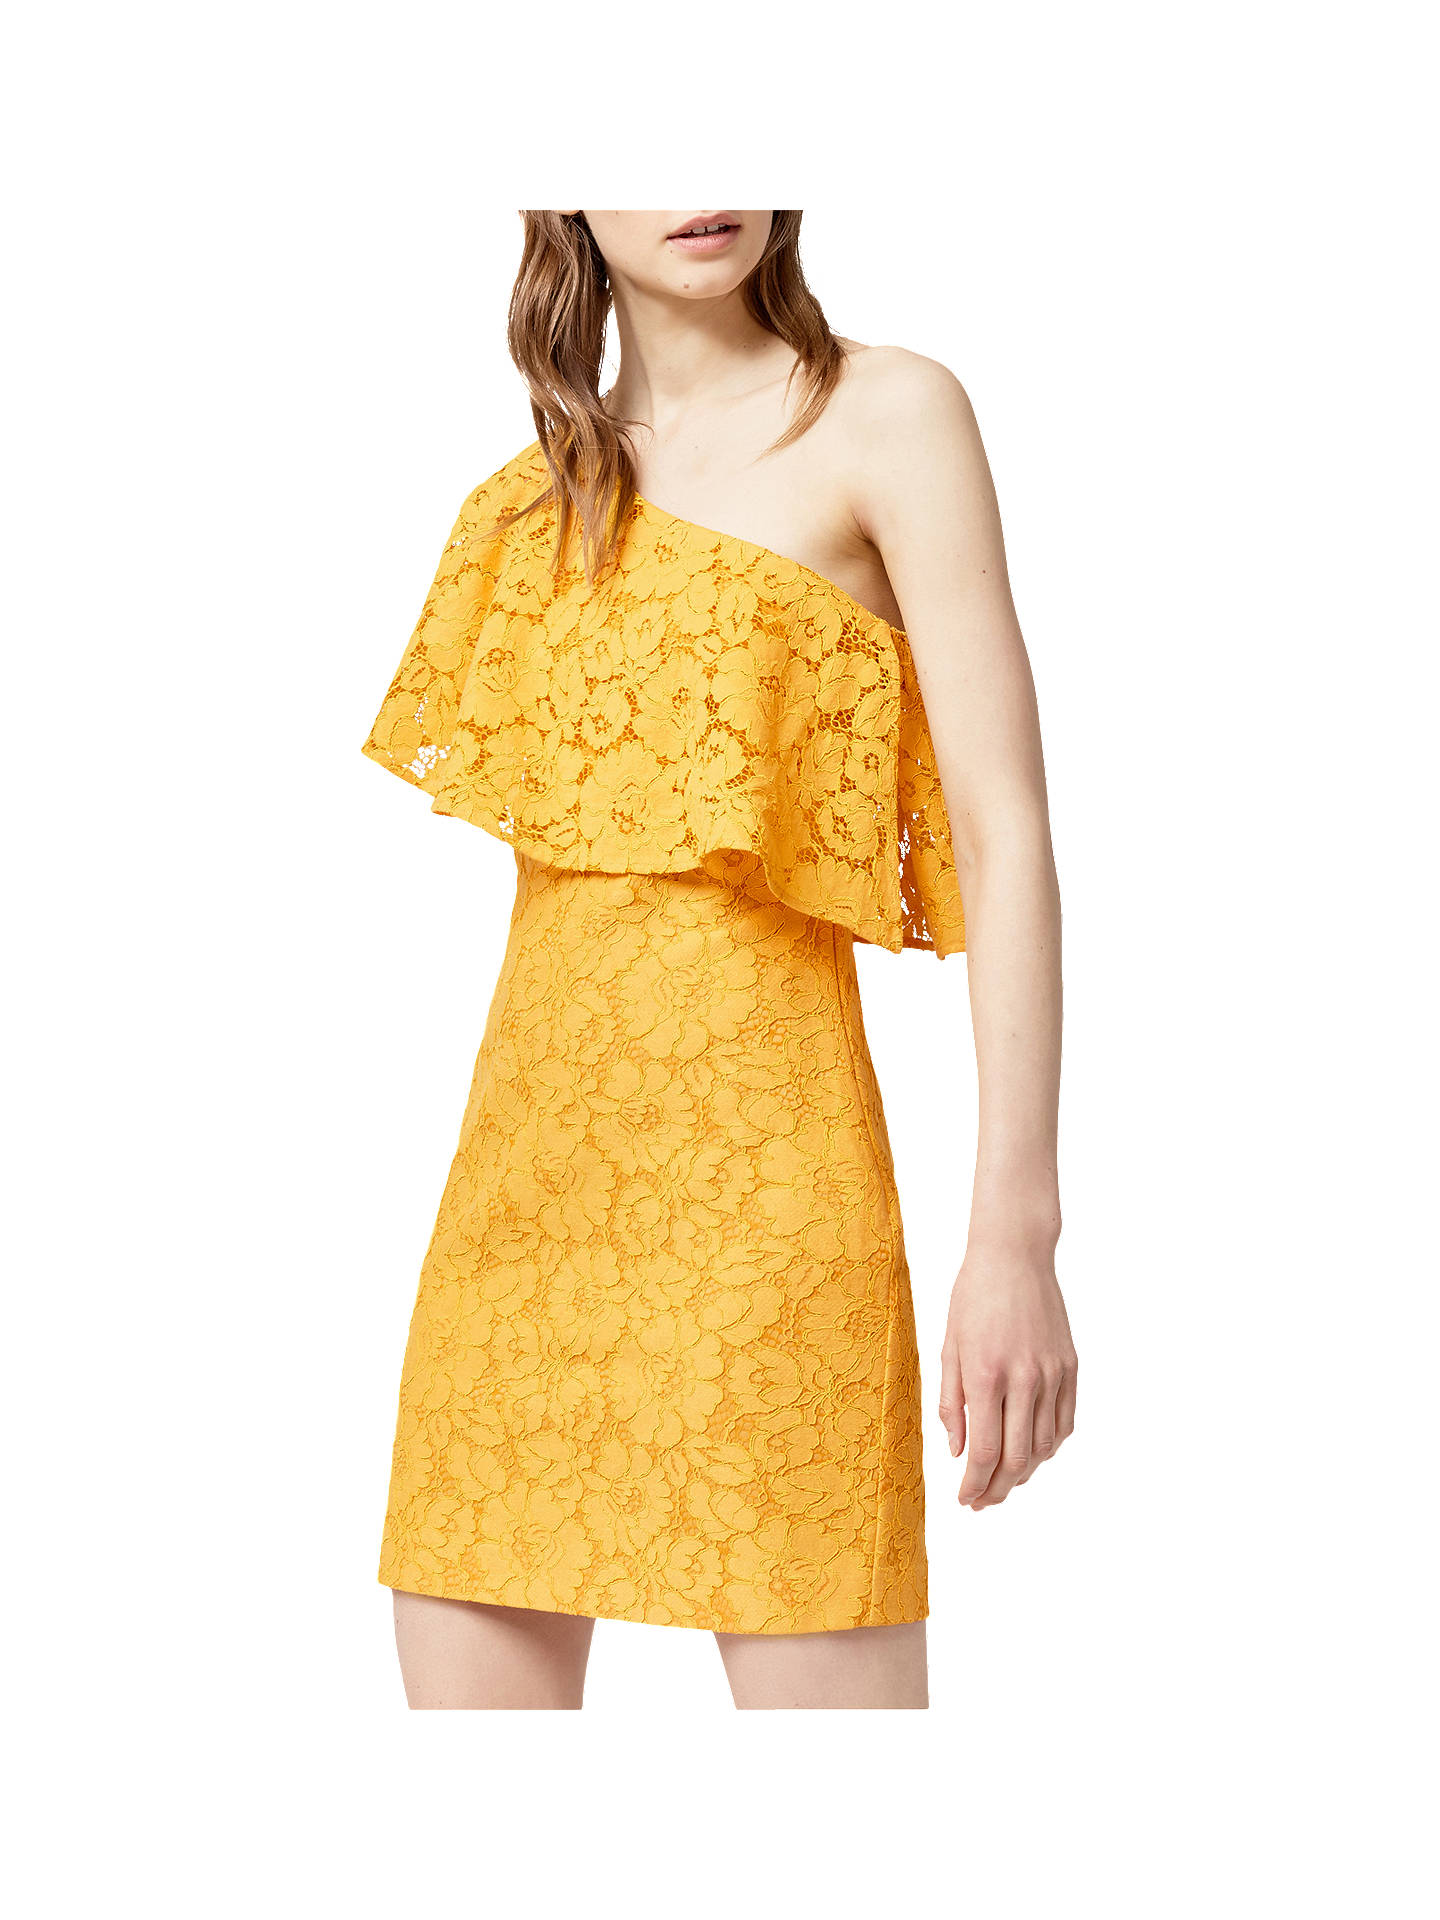 4a96ba604d91 Buy Warehouse Bonded Lace One Shoulder Dress